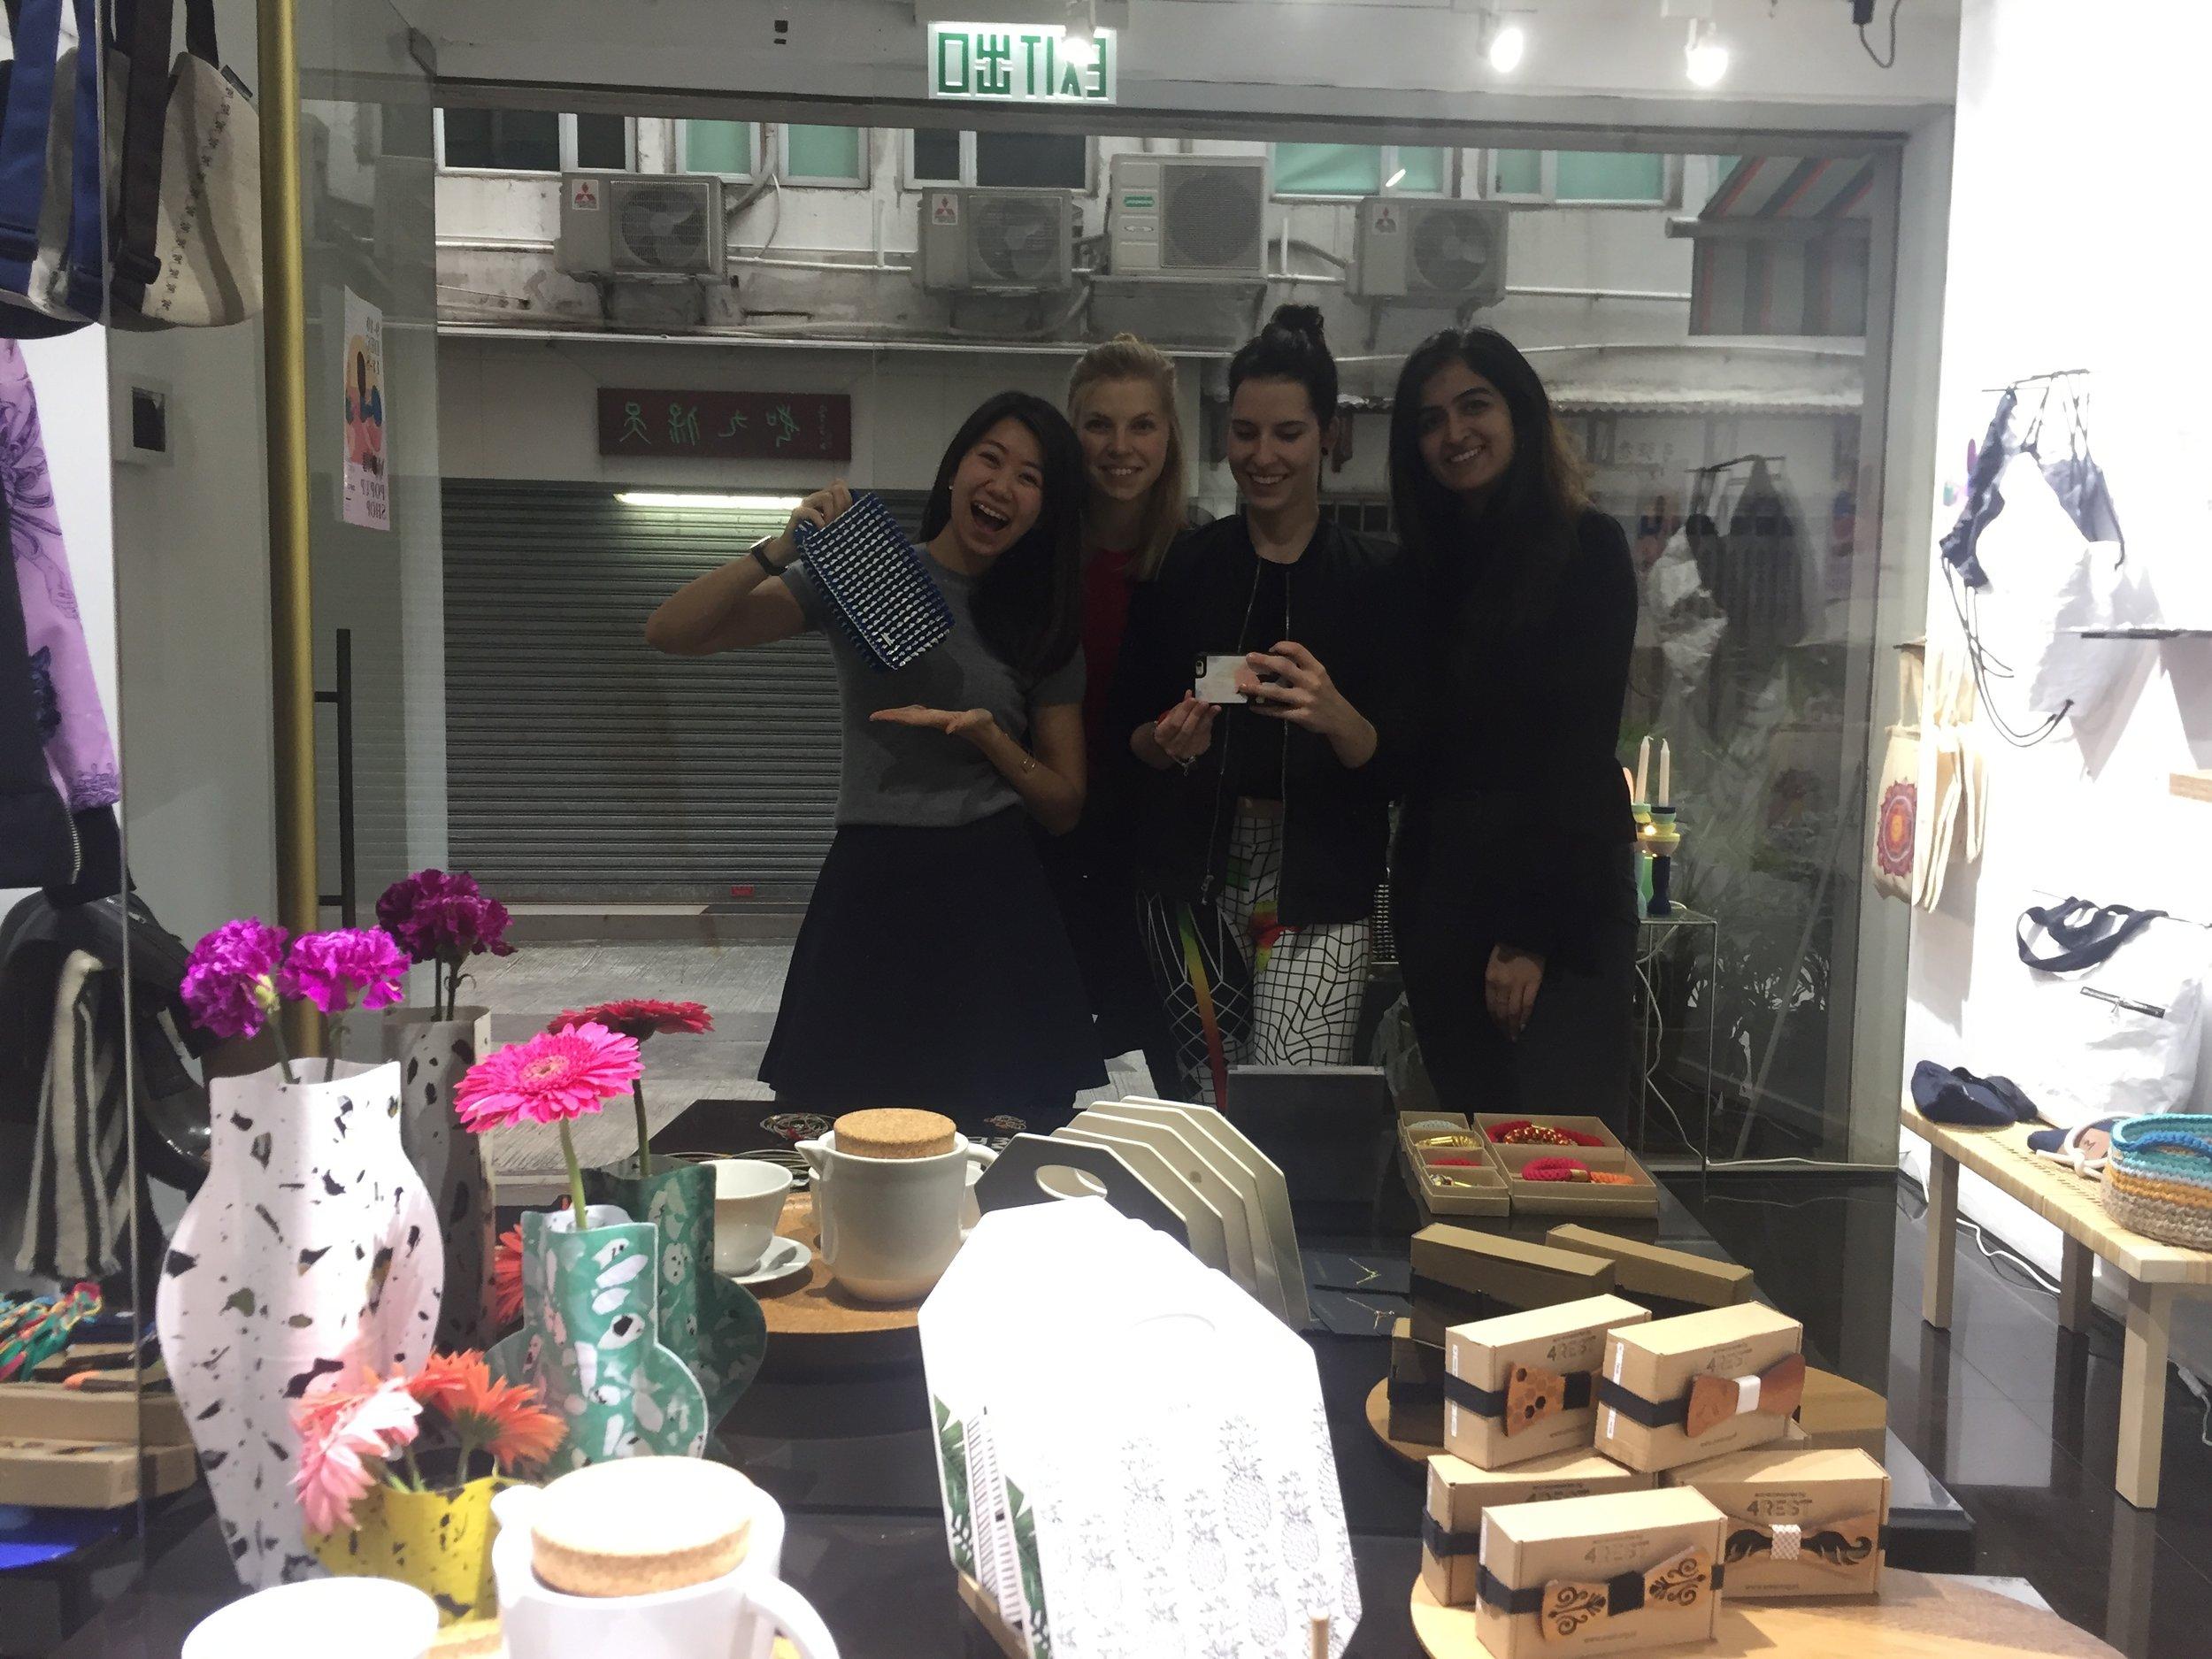 Photo with Kasia, Maria, and Bhavika